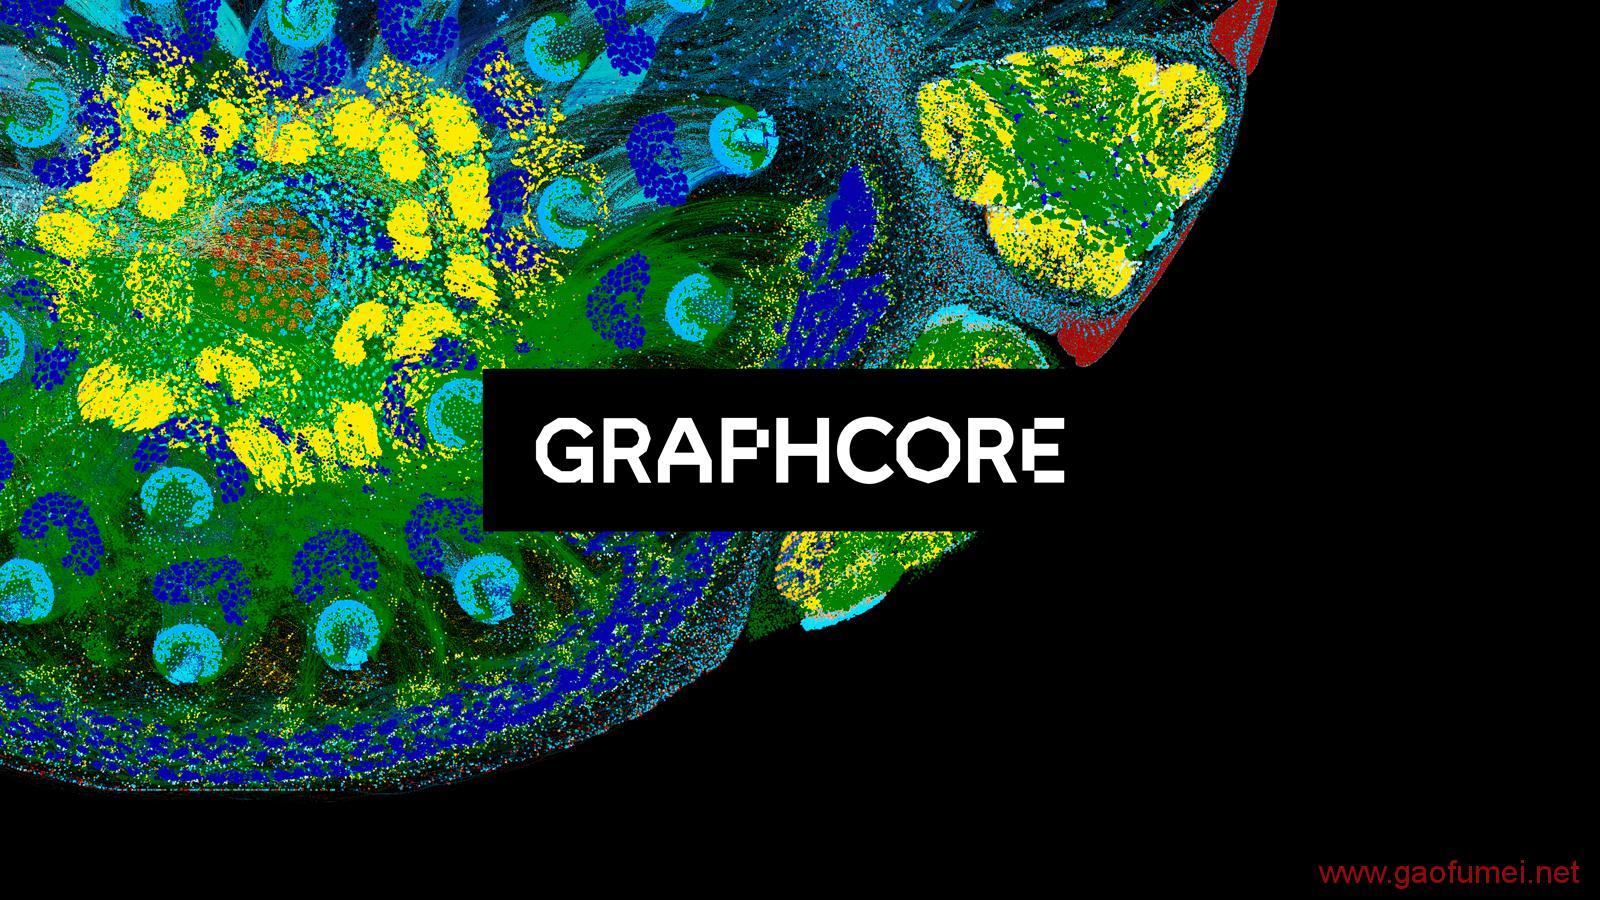 Graphcore获红杉资本5000万美元投资吊打GTX Titan X的AI加速芯片 人工智能芯片 第1张-泥人传说